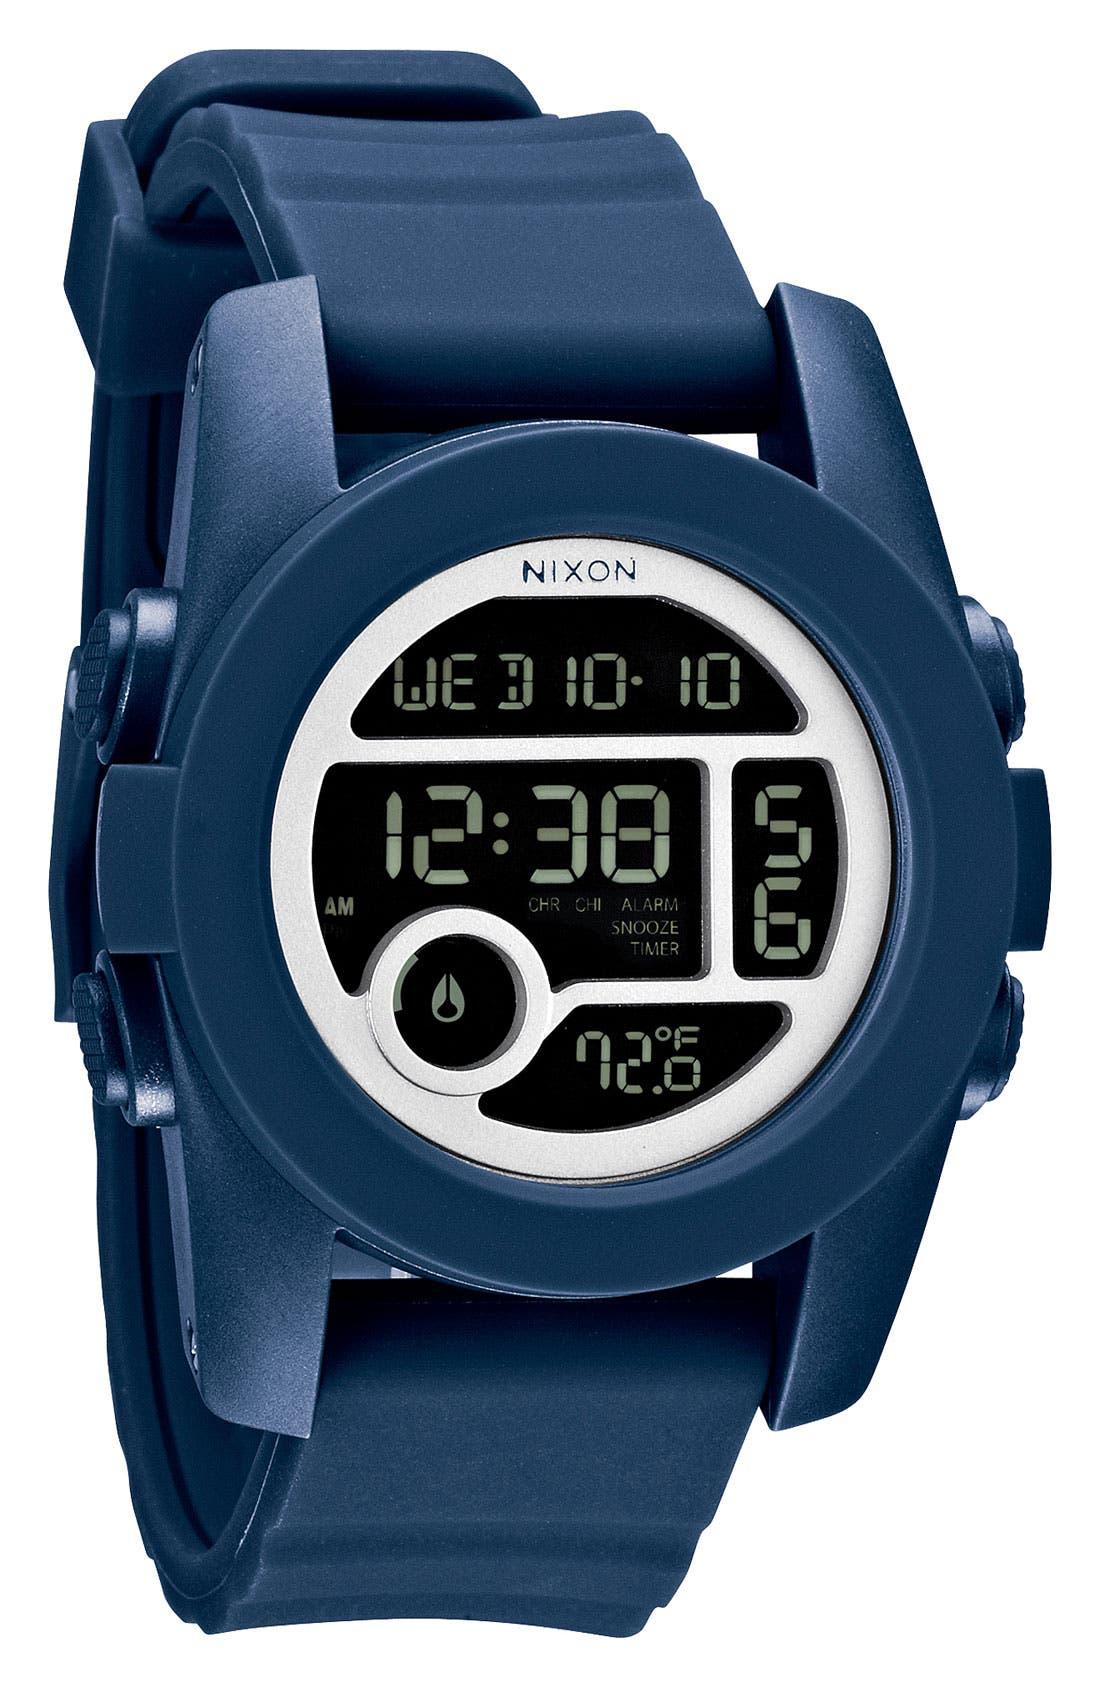 Main Image - Nixon 'The Unit 40' Round Digital Watch, 40mm